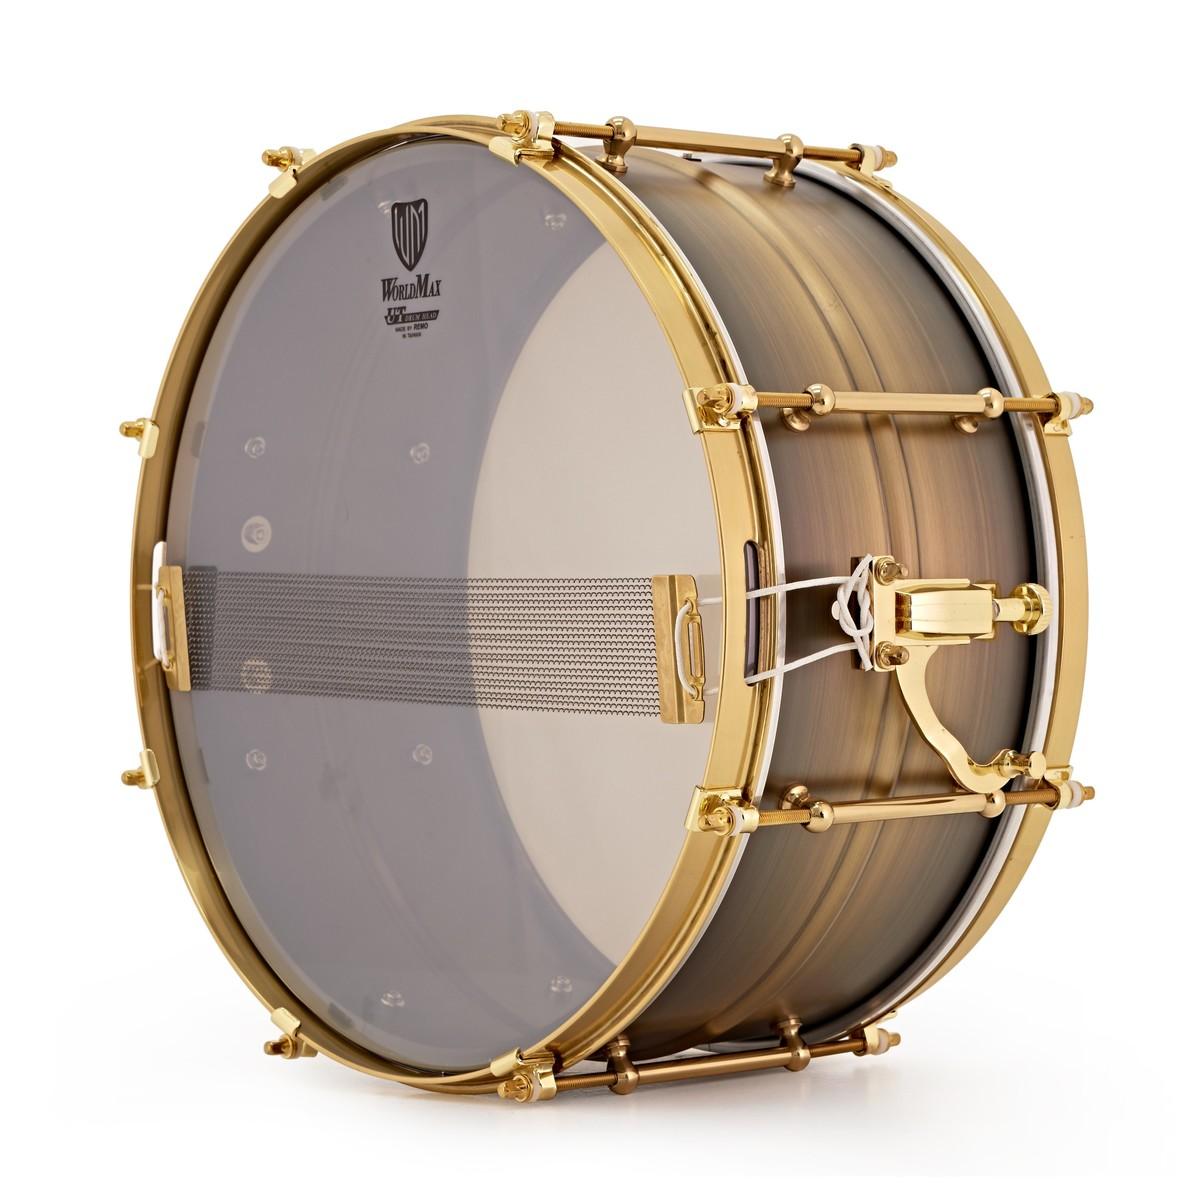 WorldMax Black Dawg 14\'\' x 6.5\'\' Antique Brushed Brass Snare Drum ...